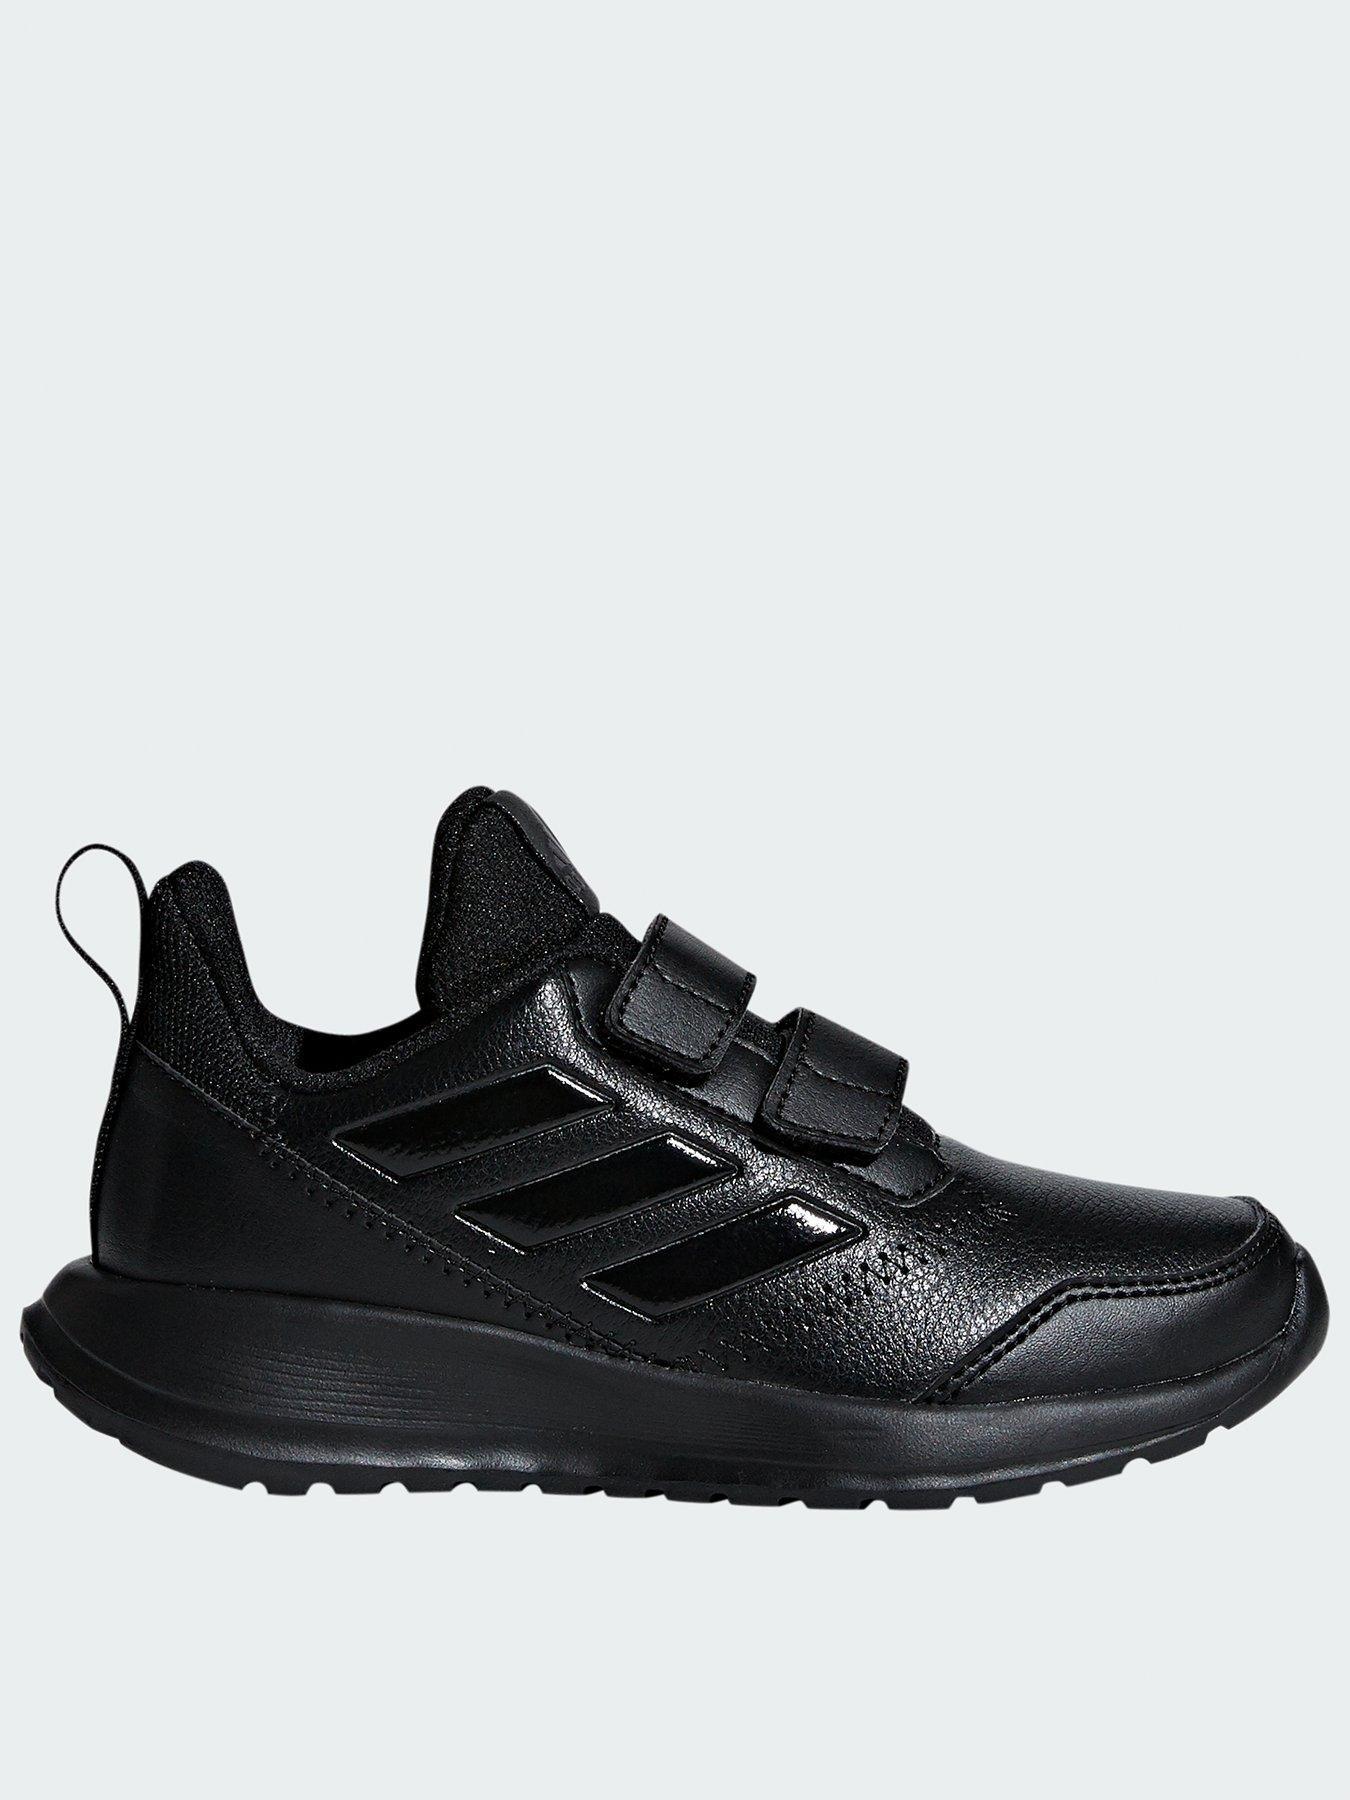 Adidas Altarun Cf Childrens Trainers